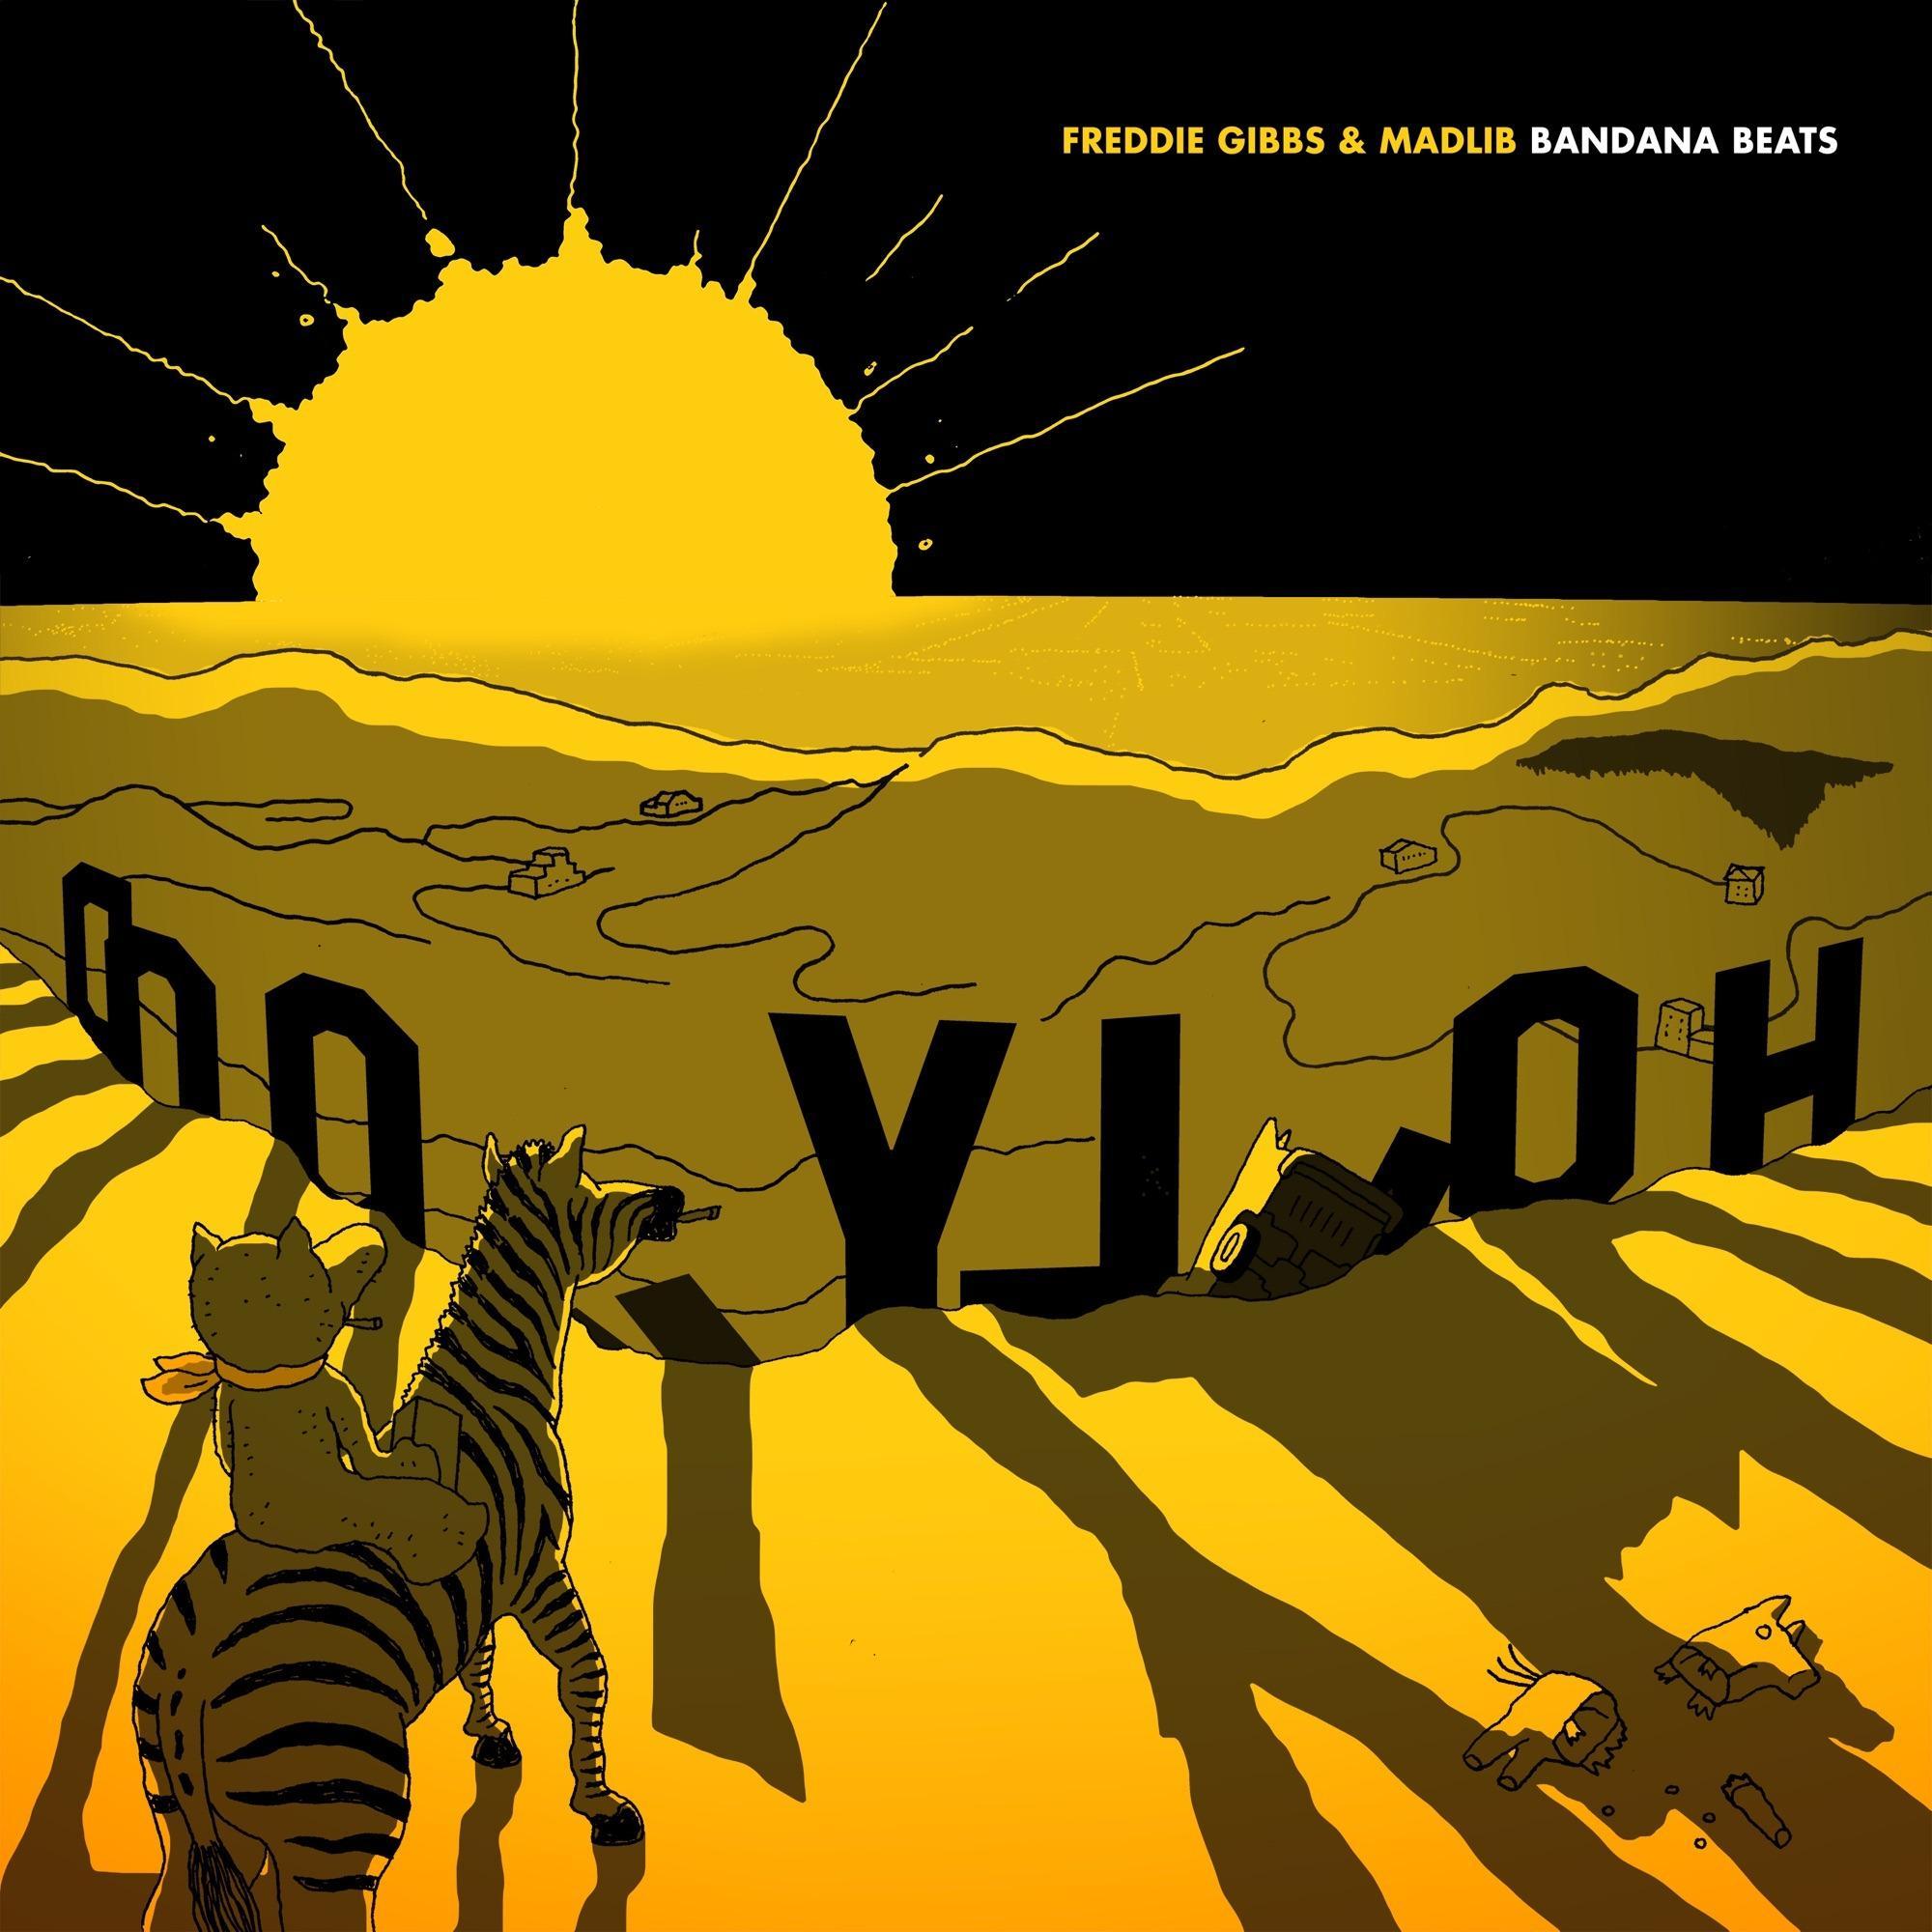 Freddie Gibbs & Madlib – Bandana Beats